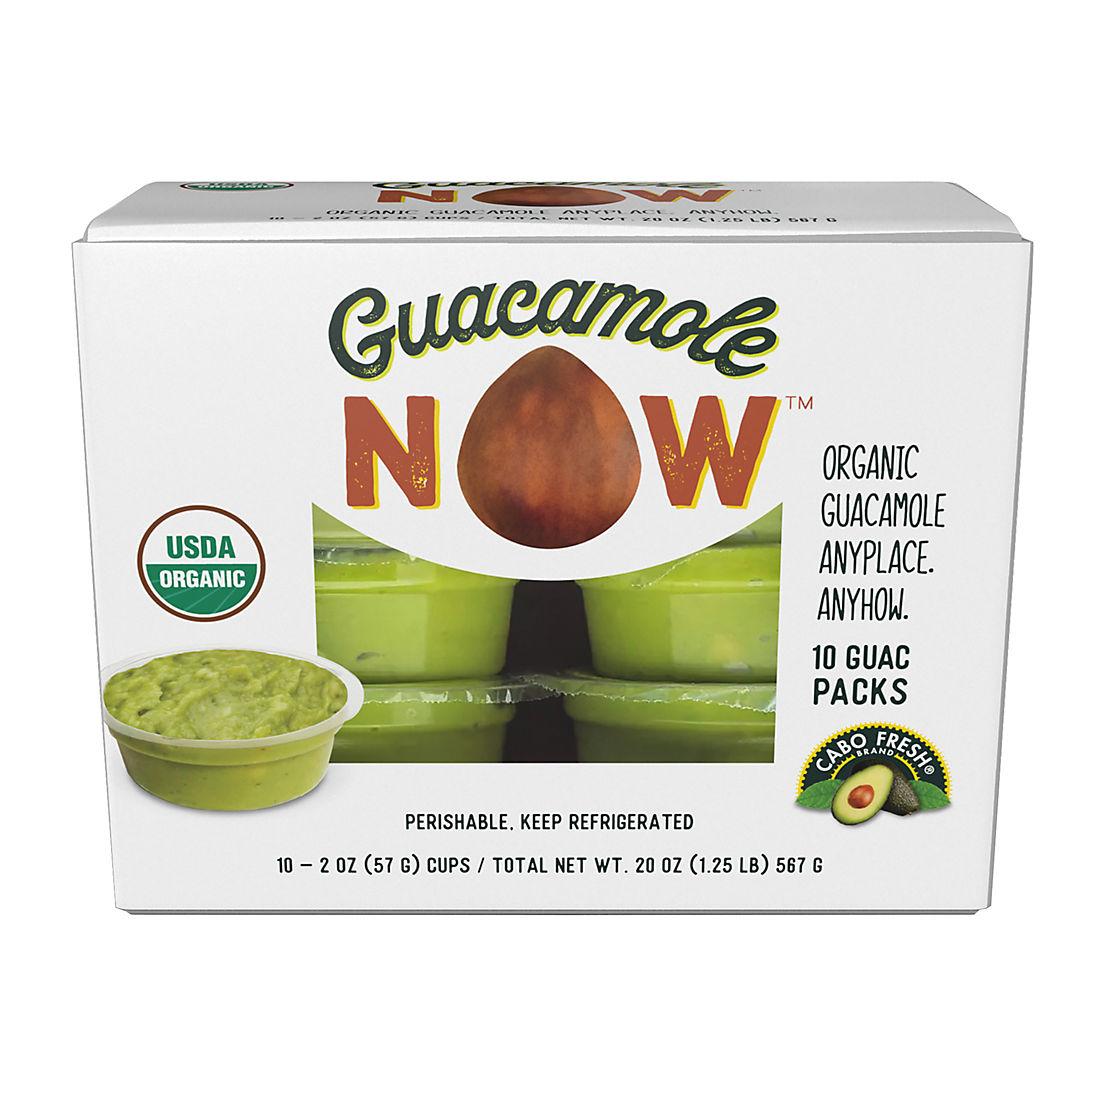 Cabo Fresh Guacamole Snack Packs, 10 ct /2 oz